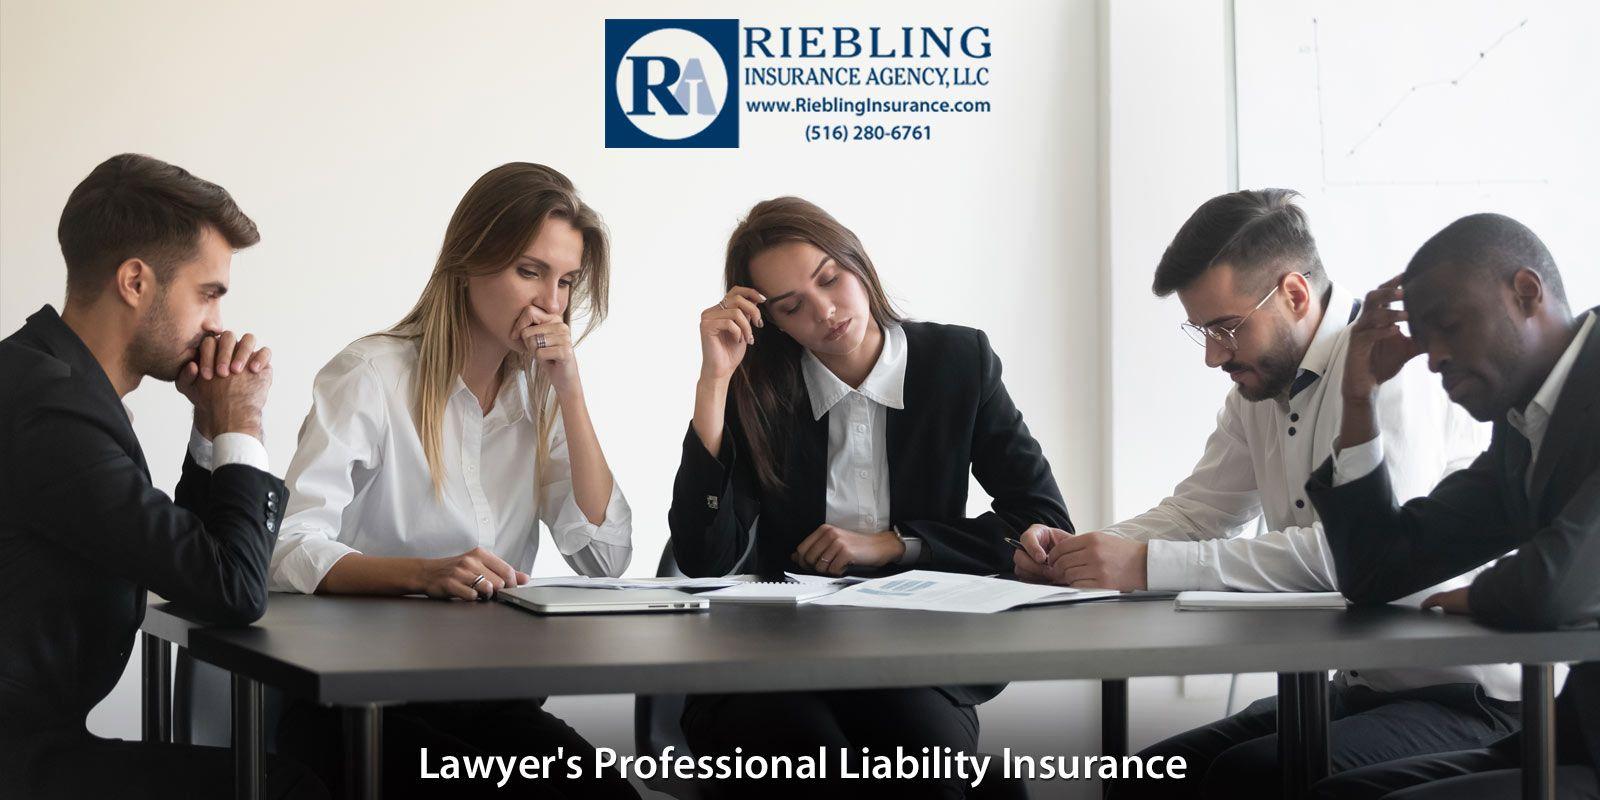 Pin on Riebling Insurance Agency